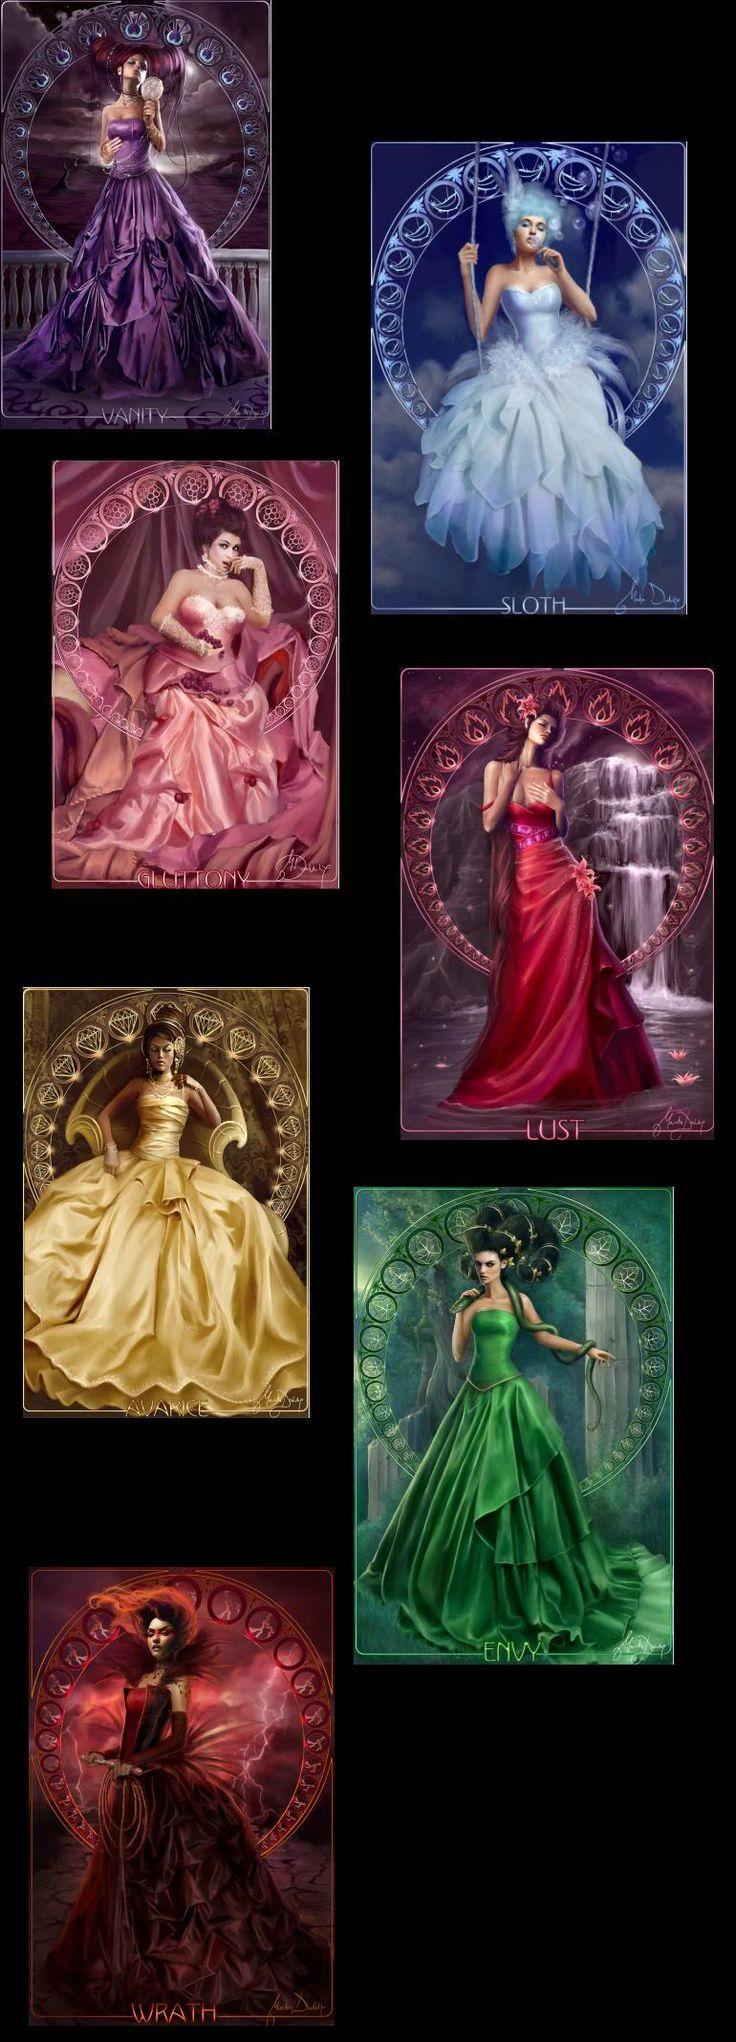 Seven Deadly Sins | Seven deadly sins, Seven ways to win | atoast2toast.com